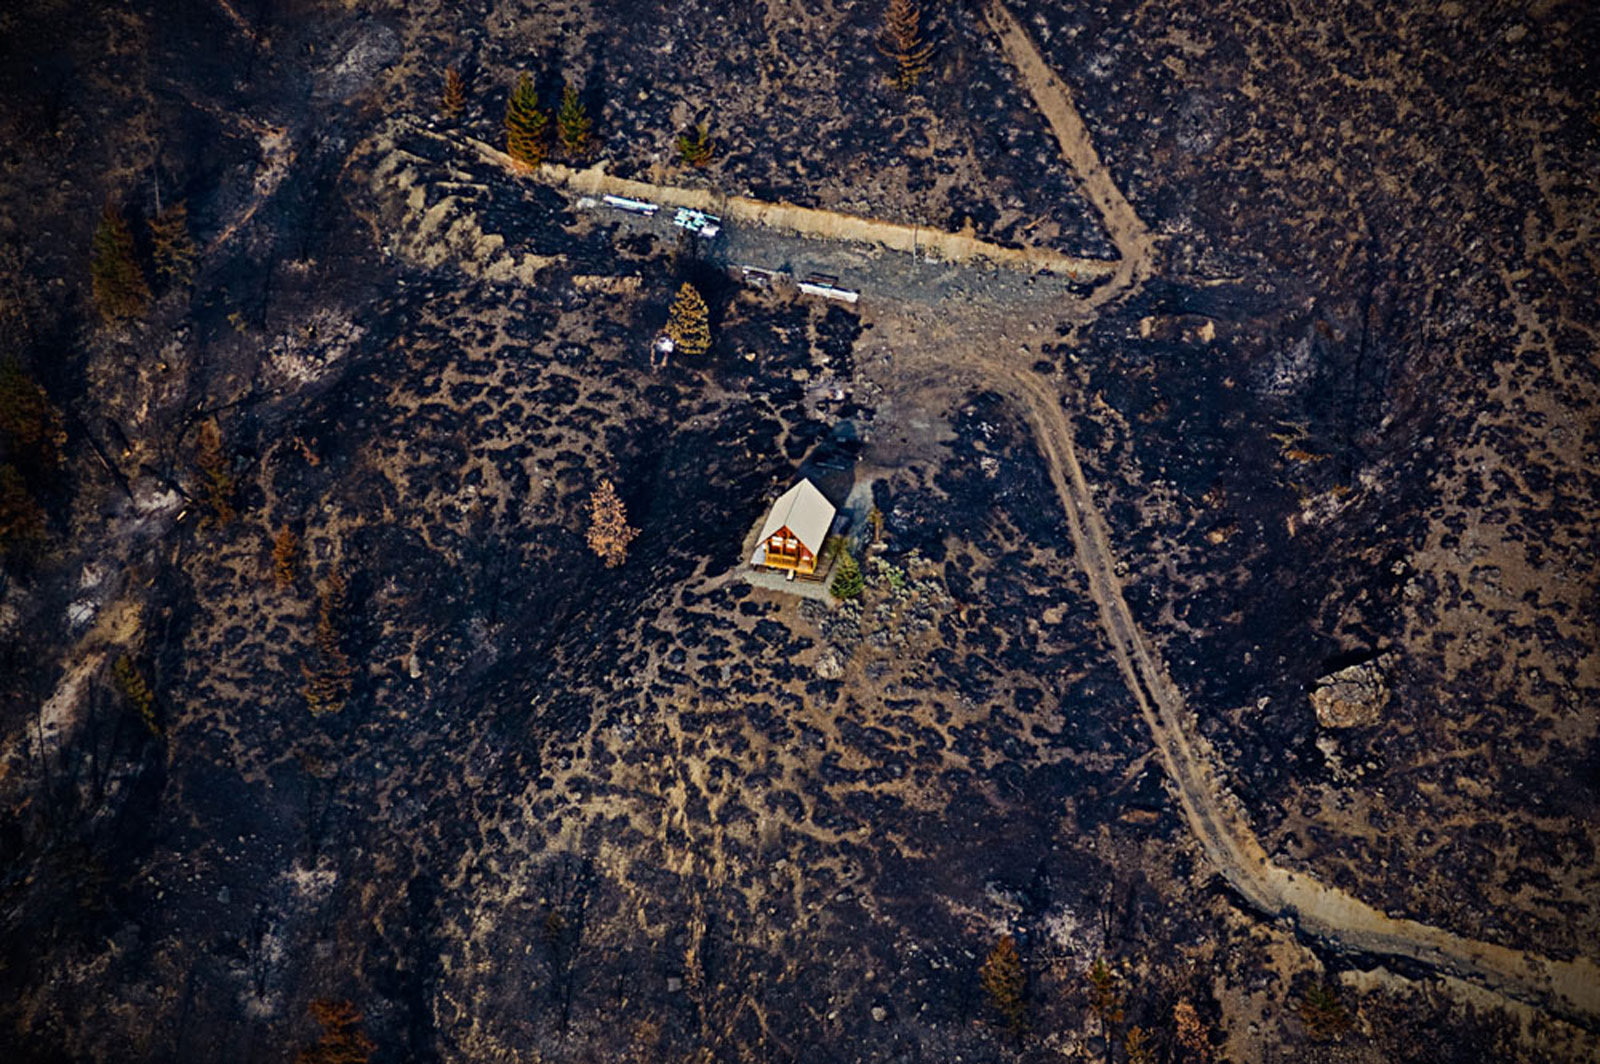 Waldbrand, Kanada © Kollektiv25